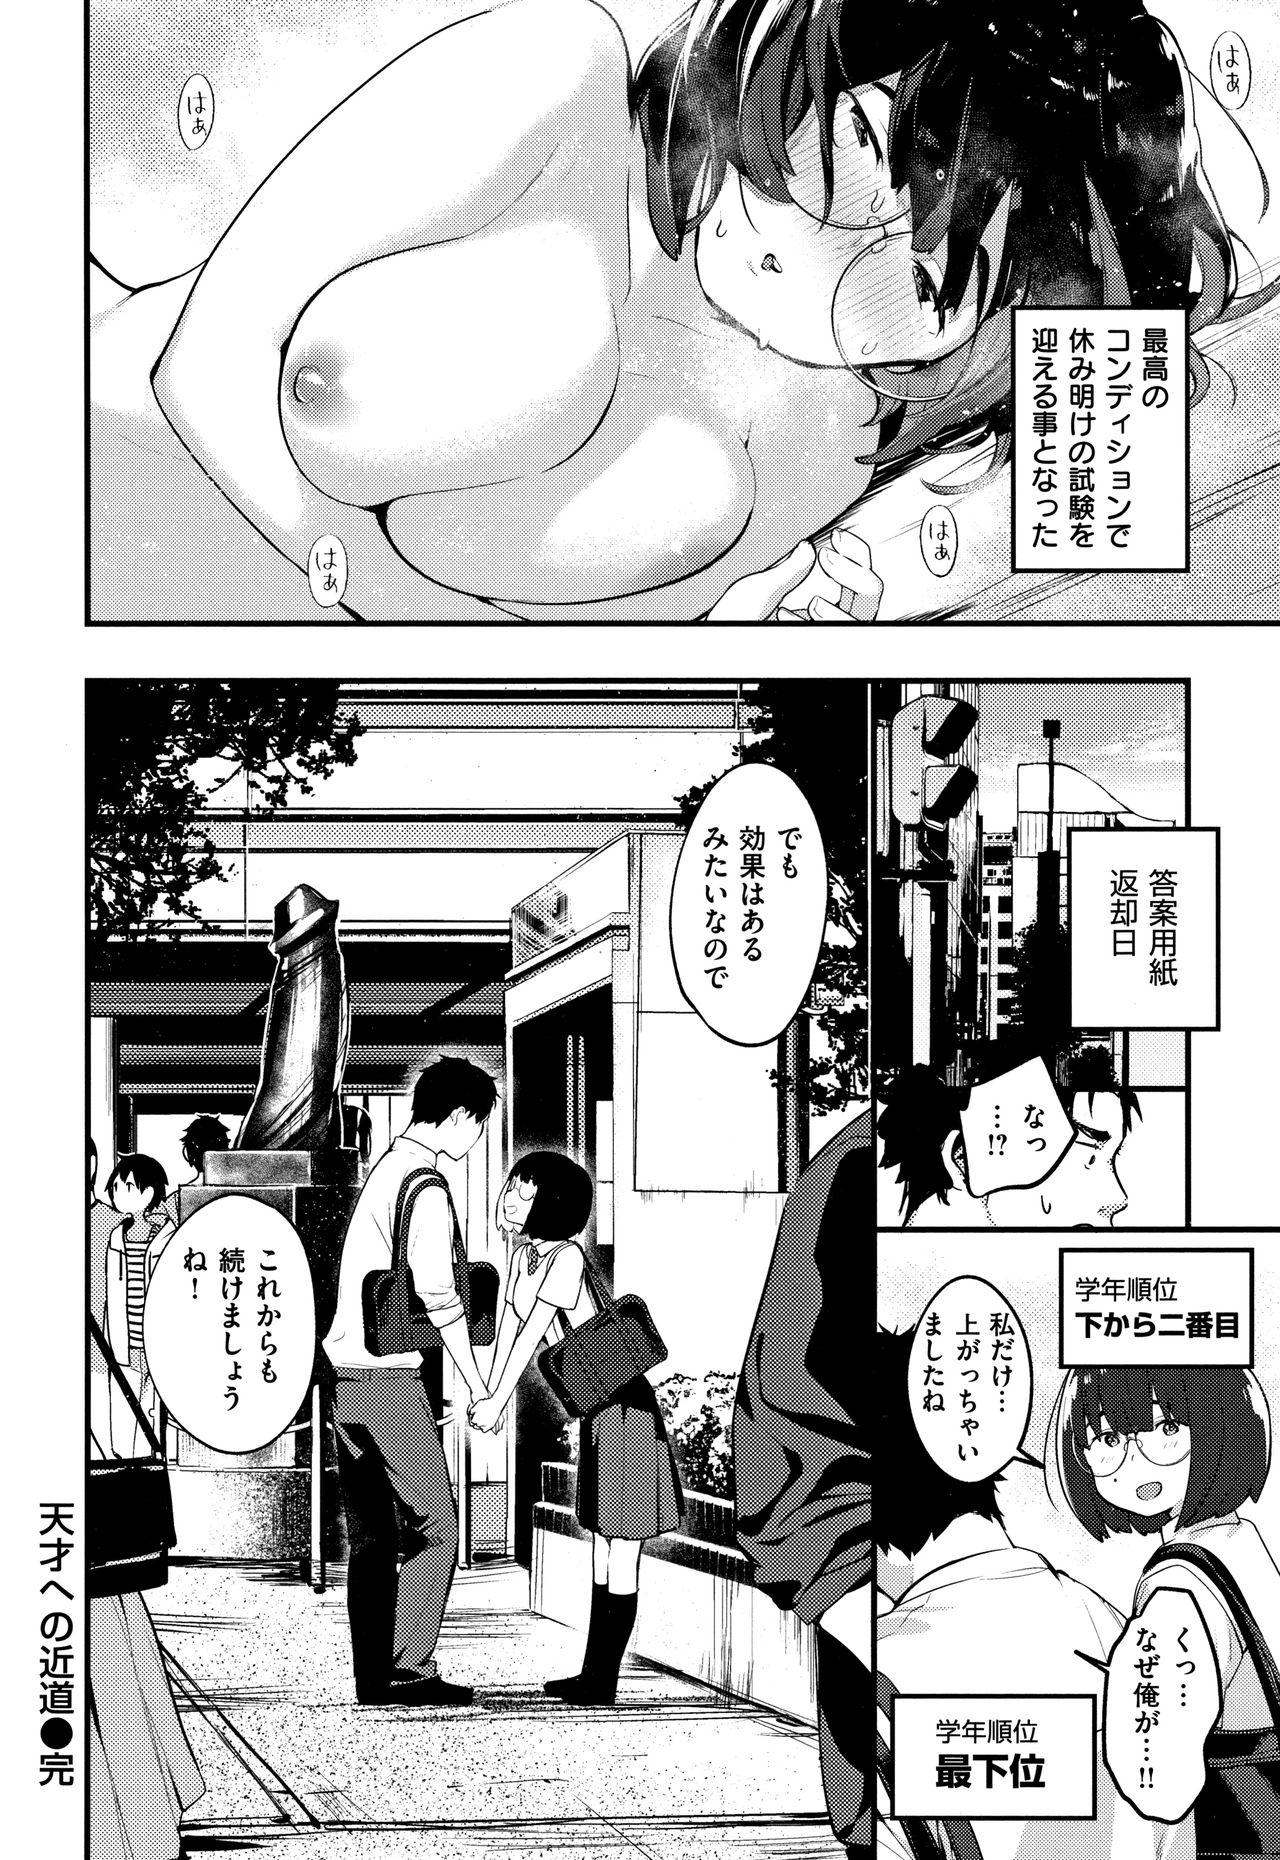 Haru to Ao - Our adolescence 68